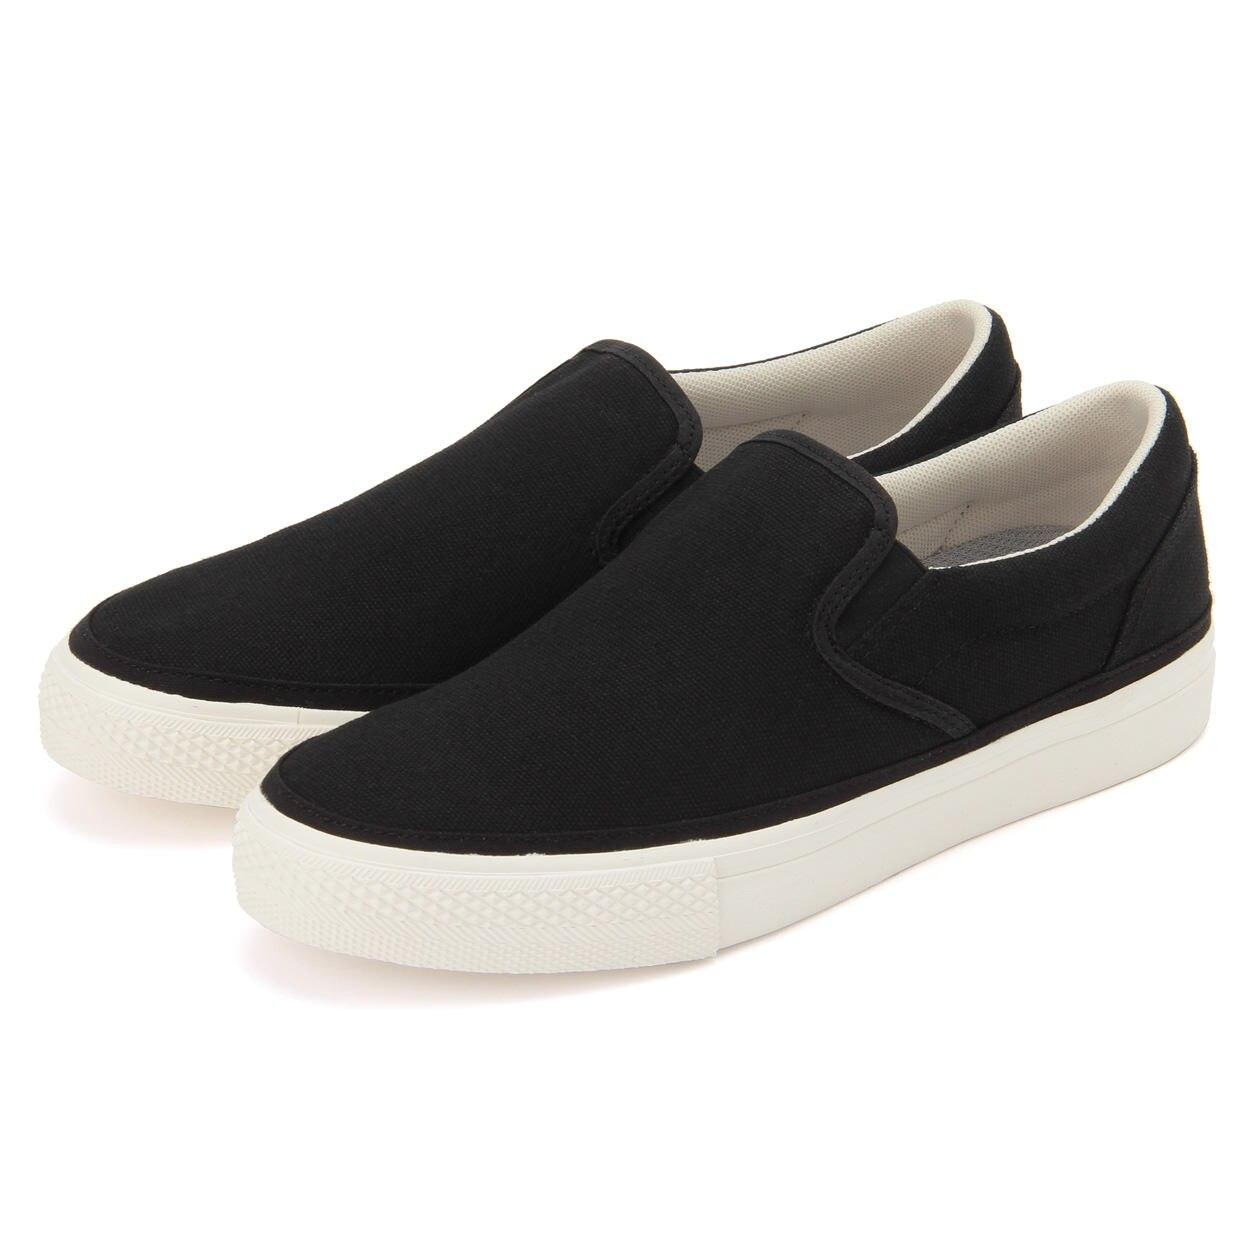 Muji Slip On Shoes